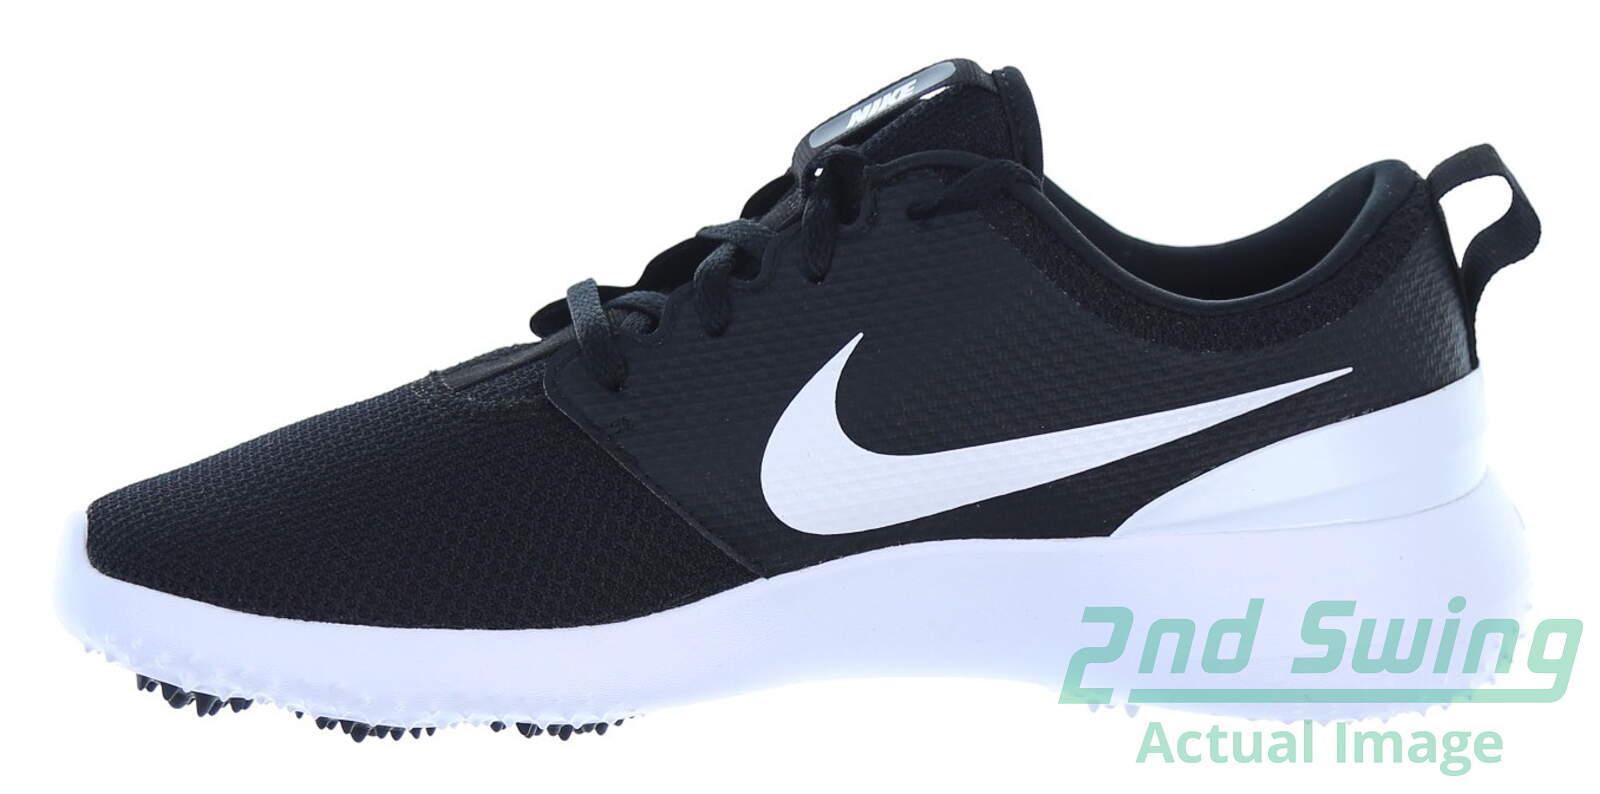 New Mens Golf Shoe Nike Roshe G 9.5 Black MSRP  80 - Golf Footwear ... ef20b98e7